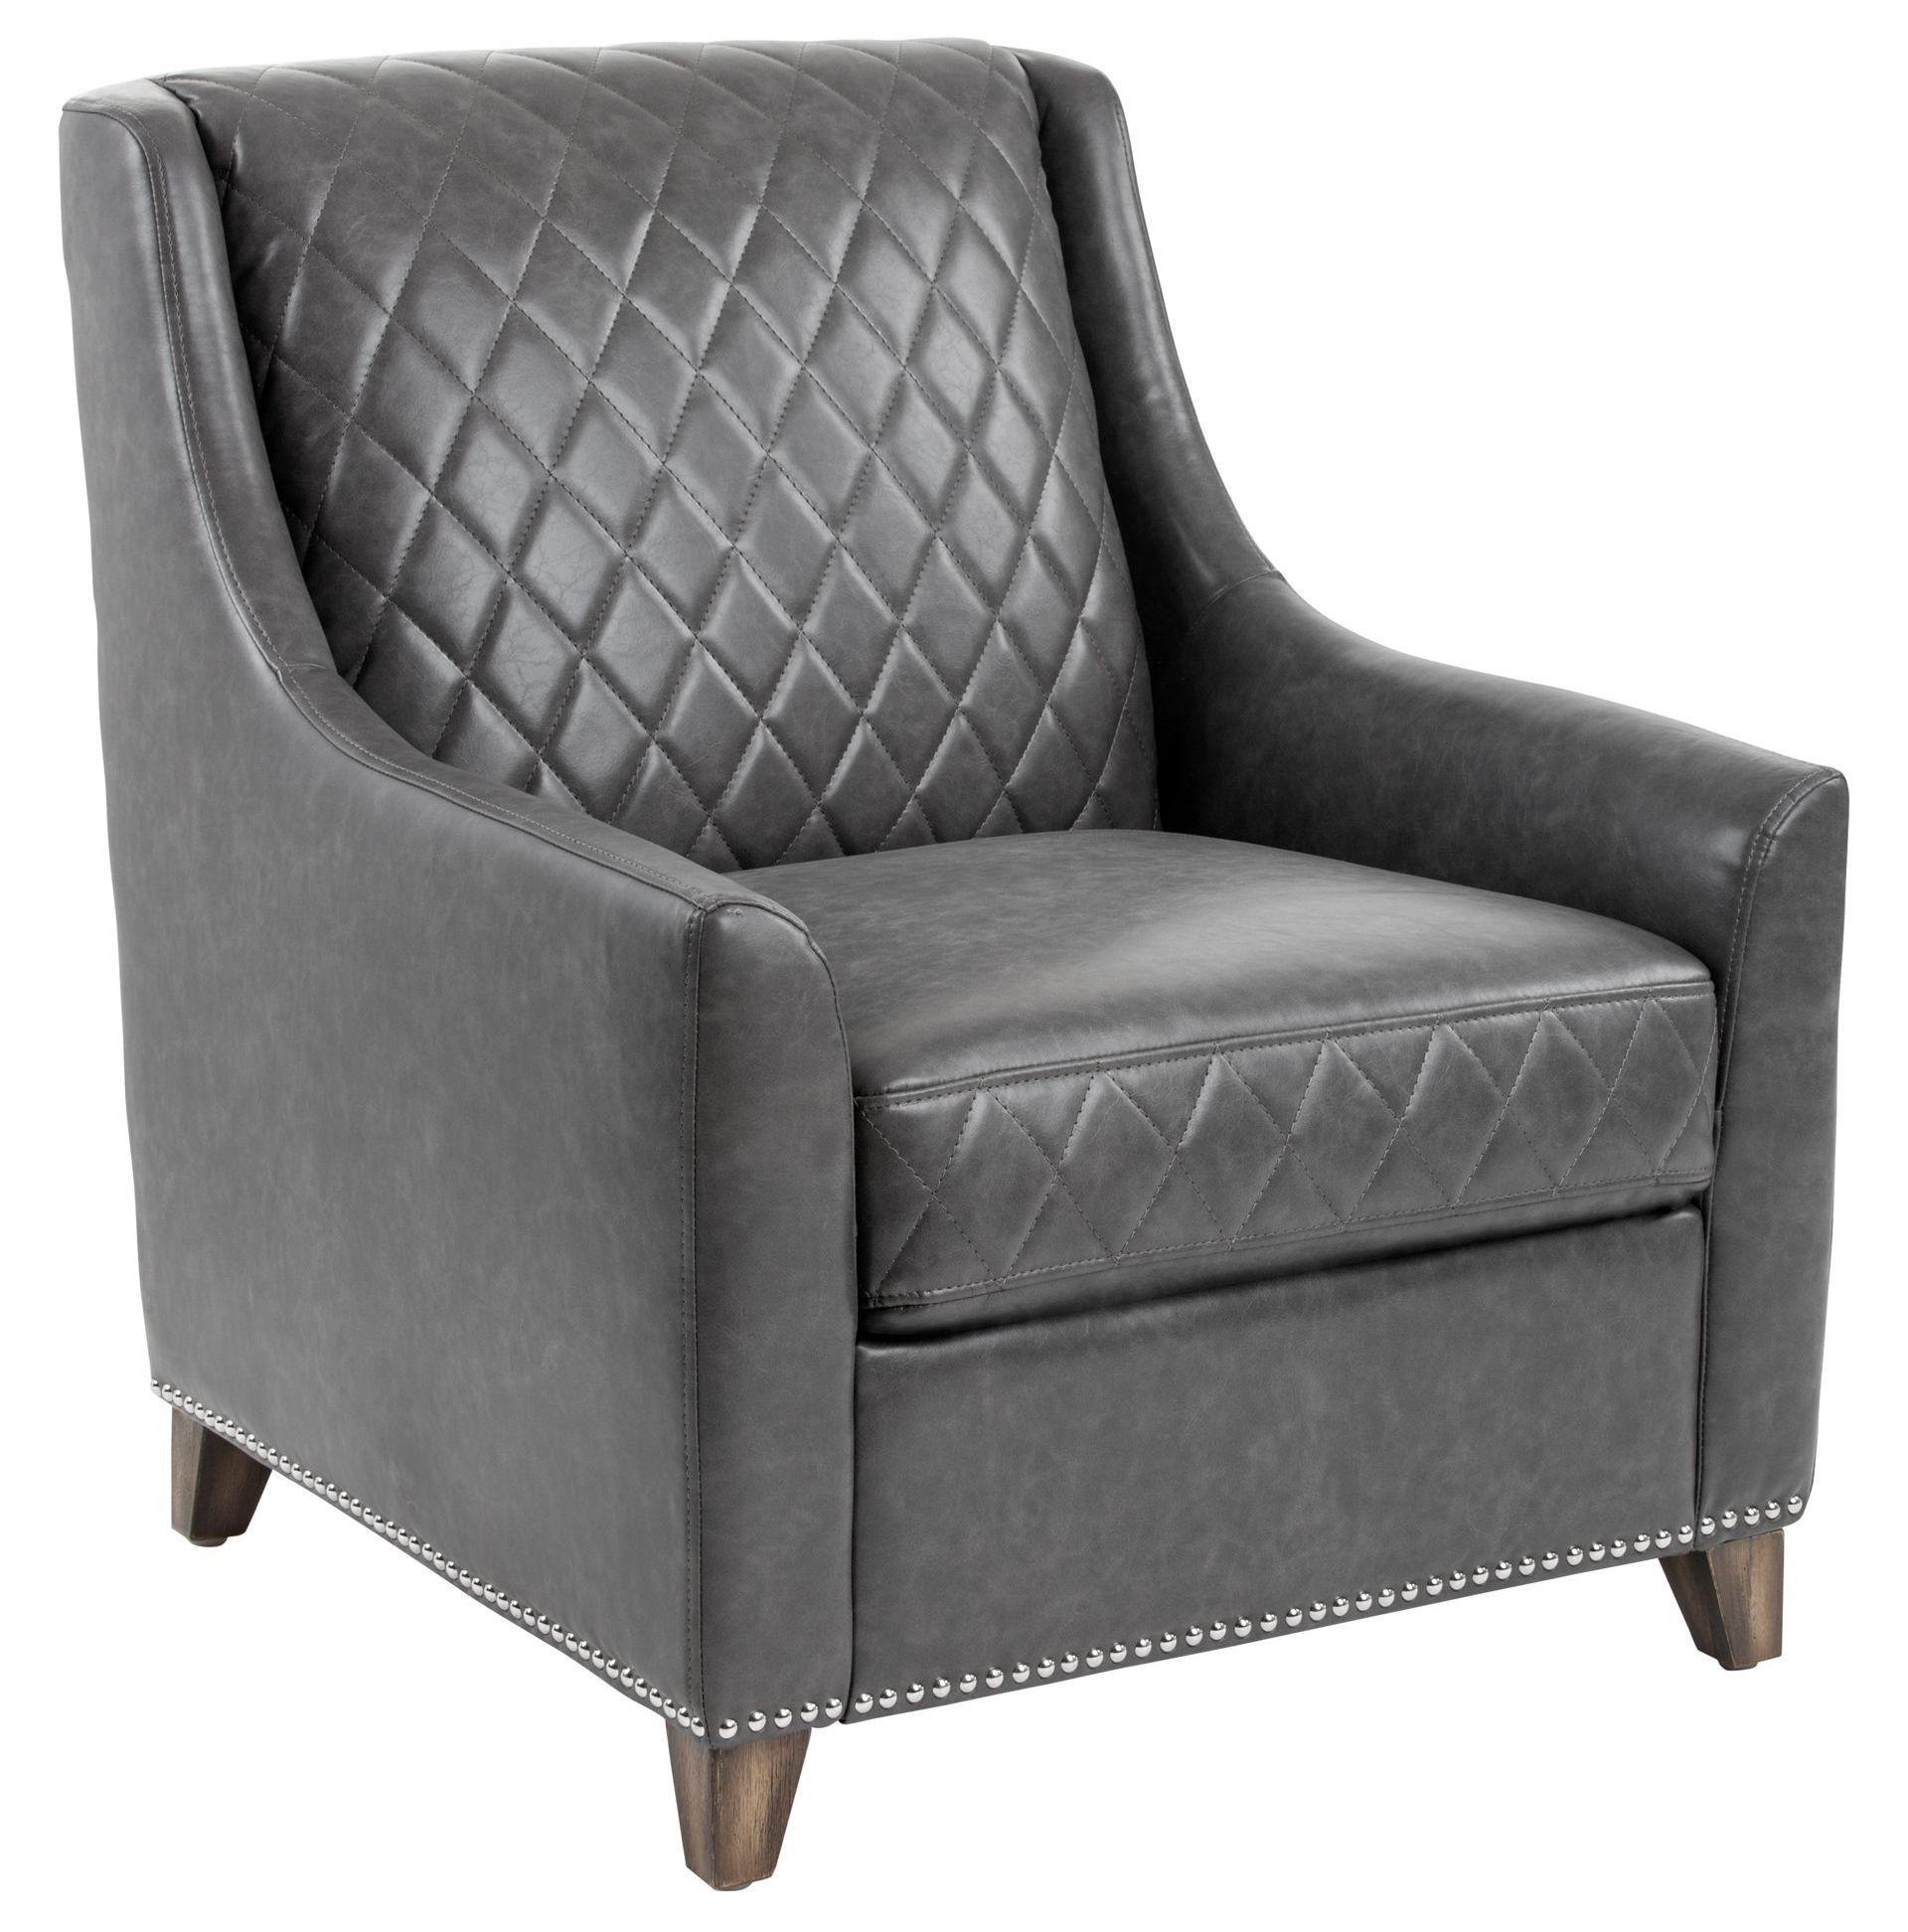 Bergamo Ash Gray Bonded Leather Armchair from Sunpan ...